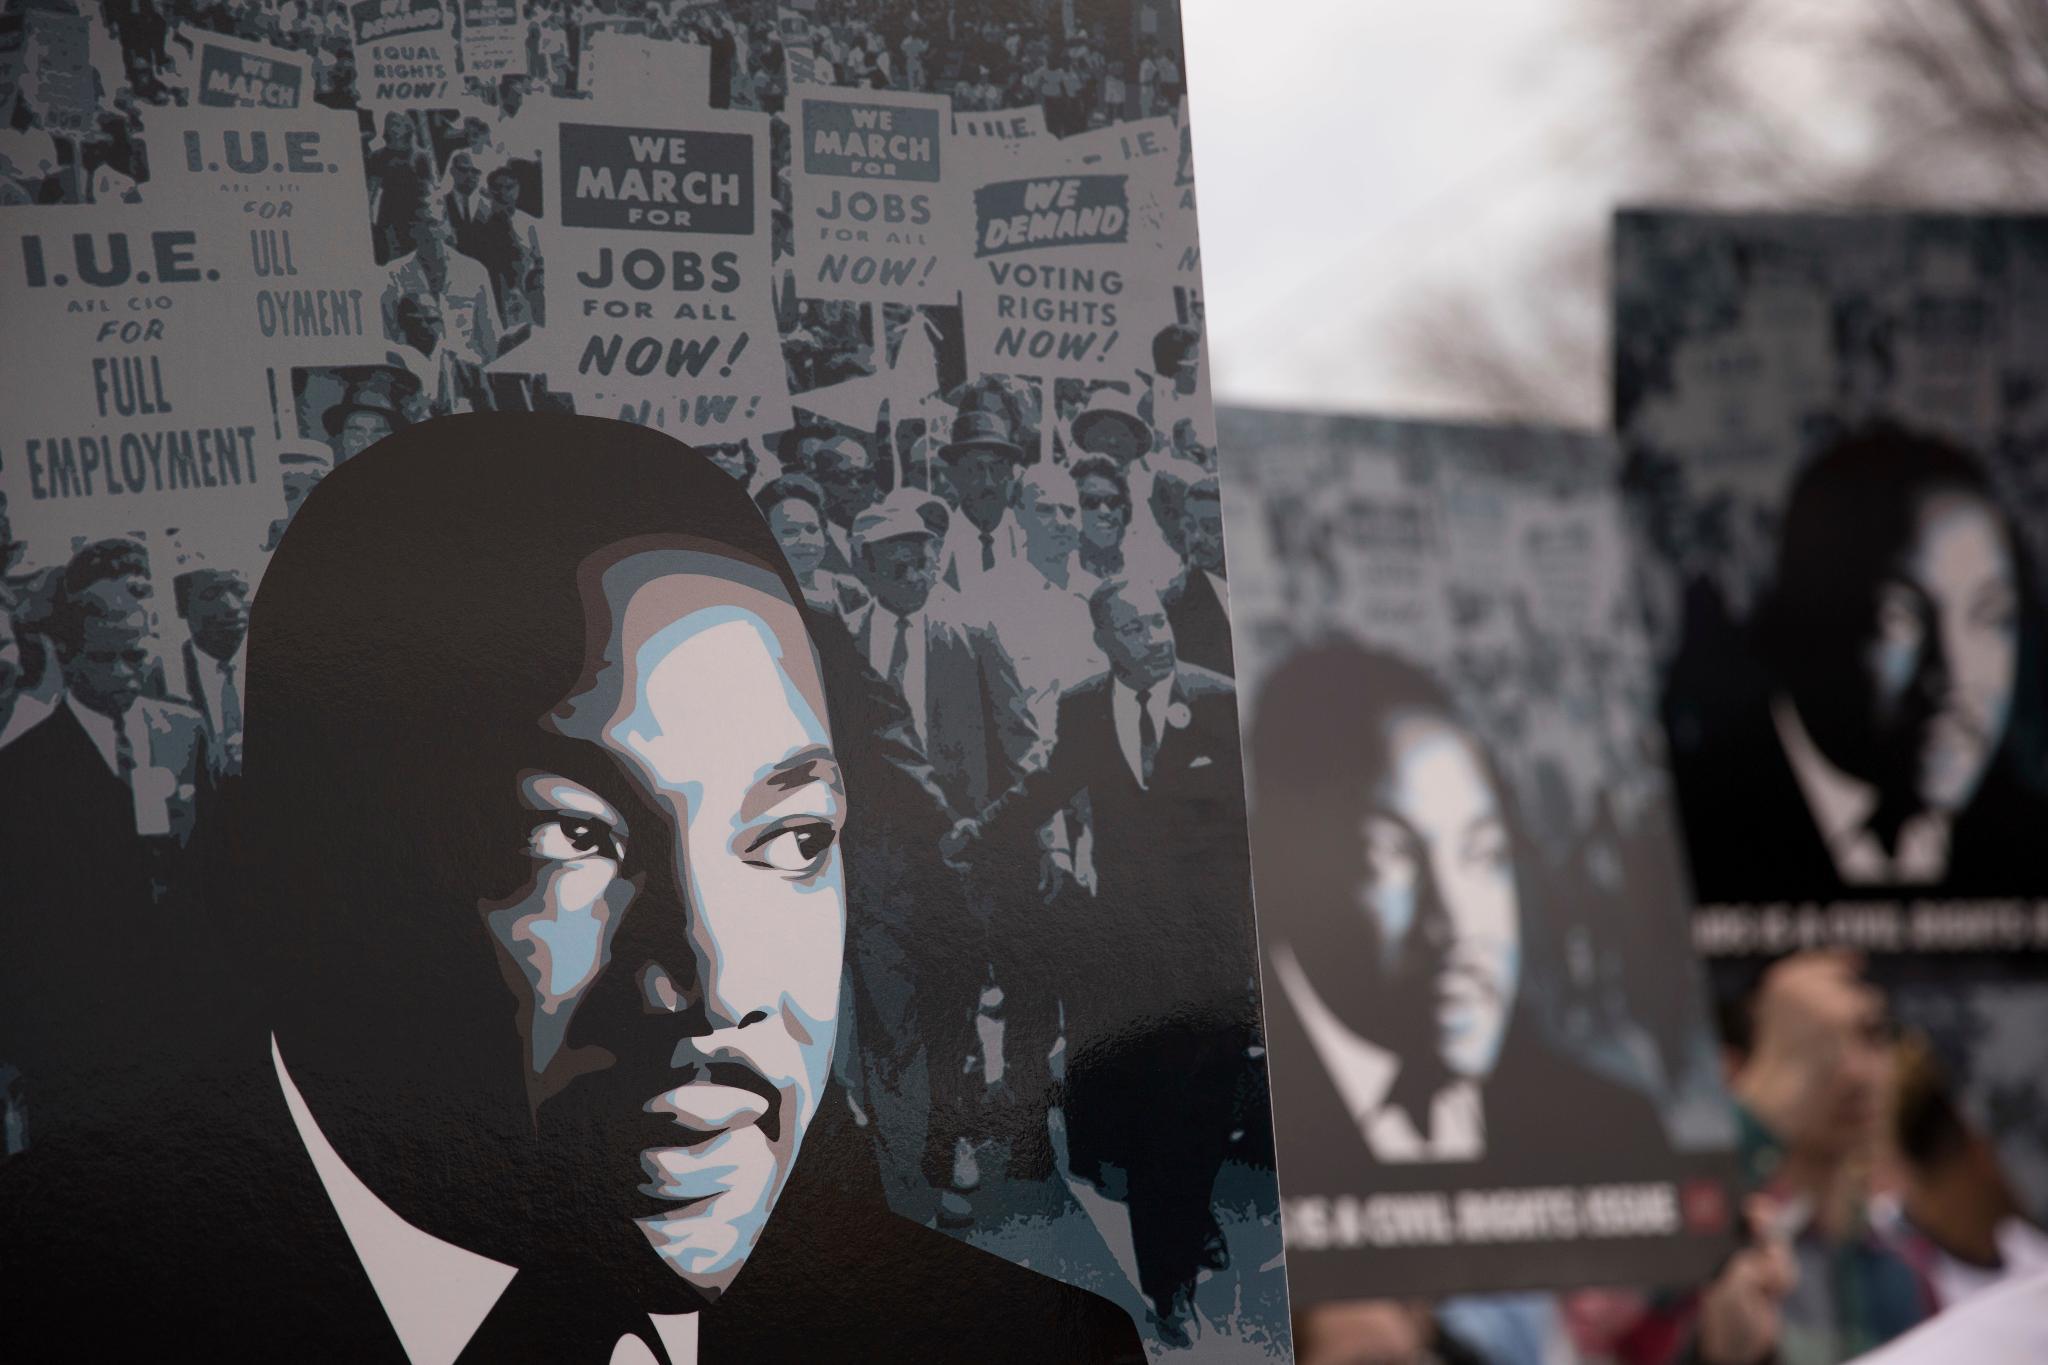 Cowboys players pay tribute to Dr. Martin Luther King Jr. #MLK50  ��: https://t.co/Ll7QATgIyO https://t.co/Qk9OvS2T1G